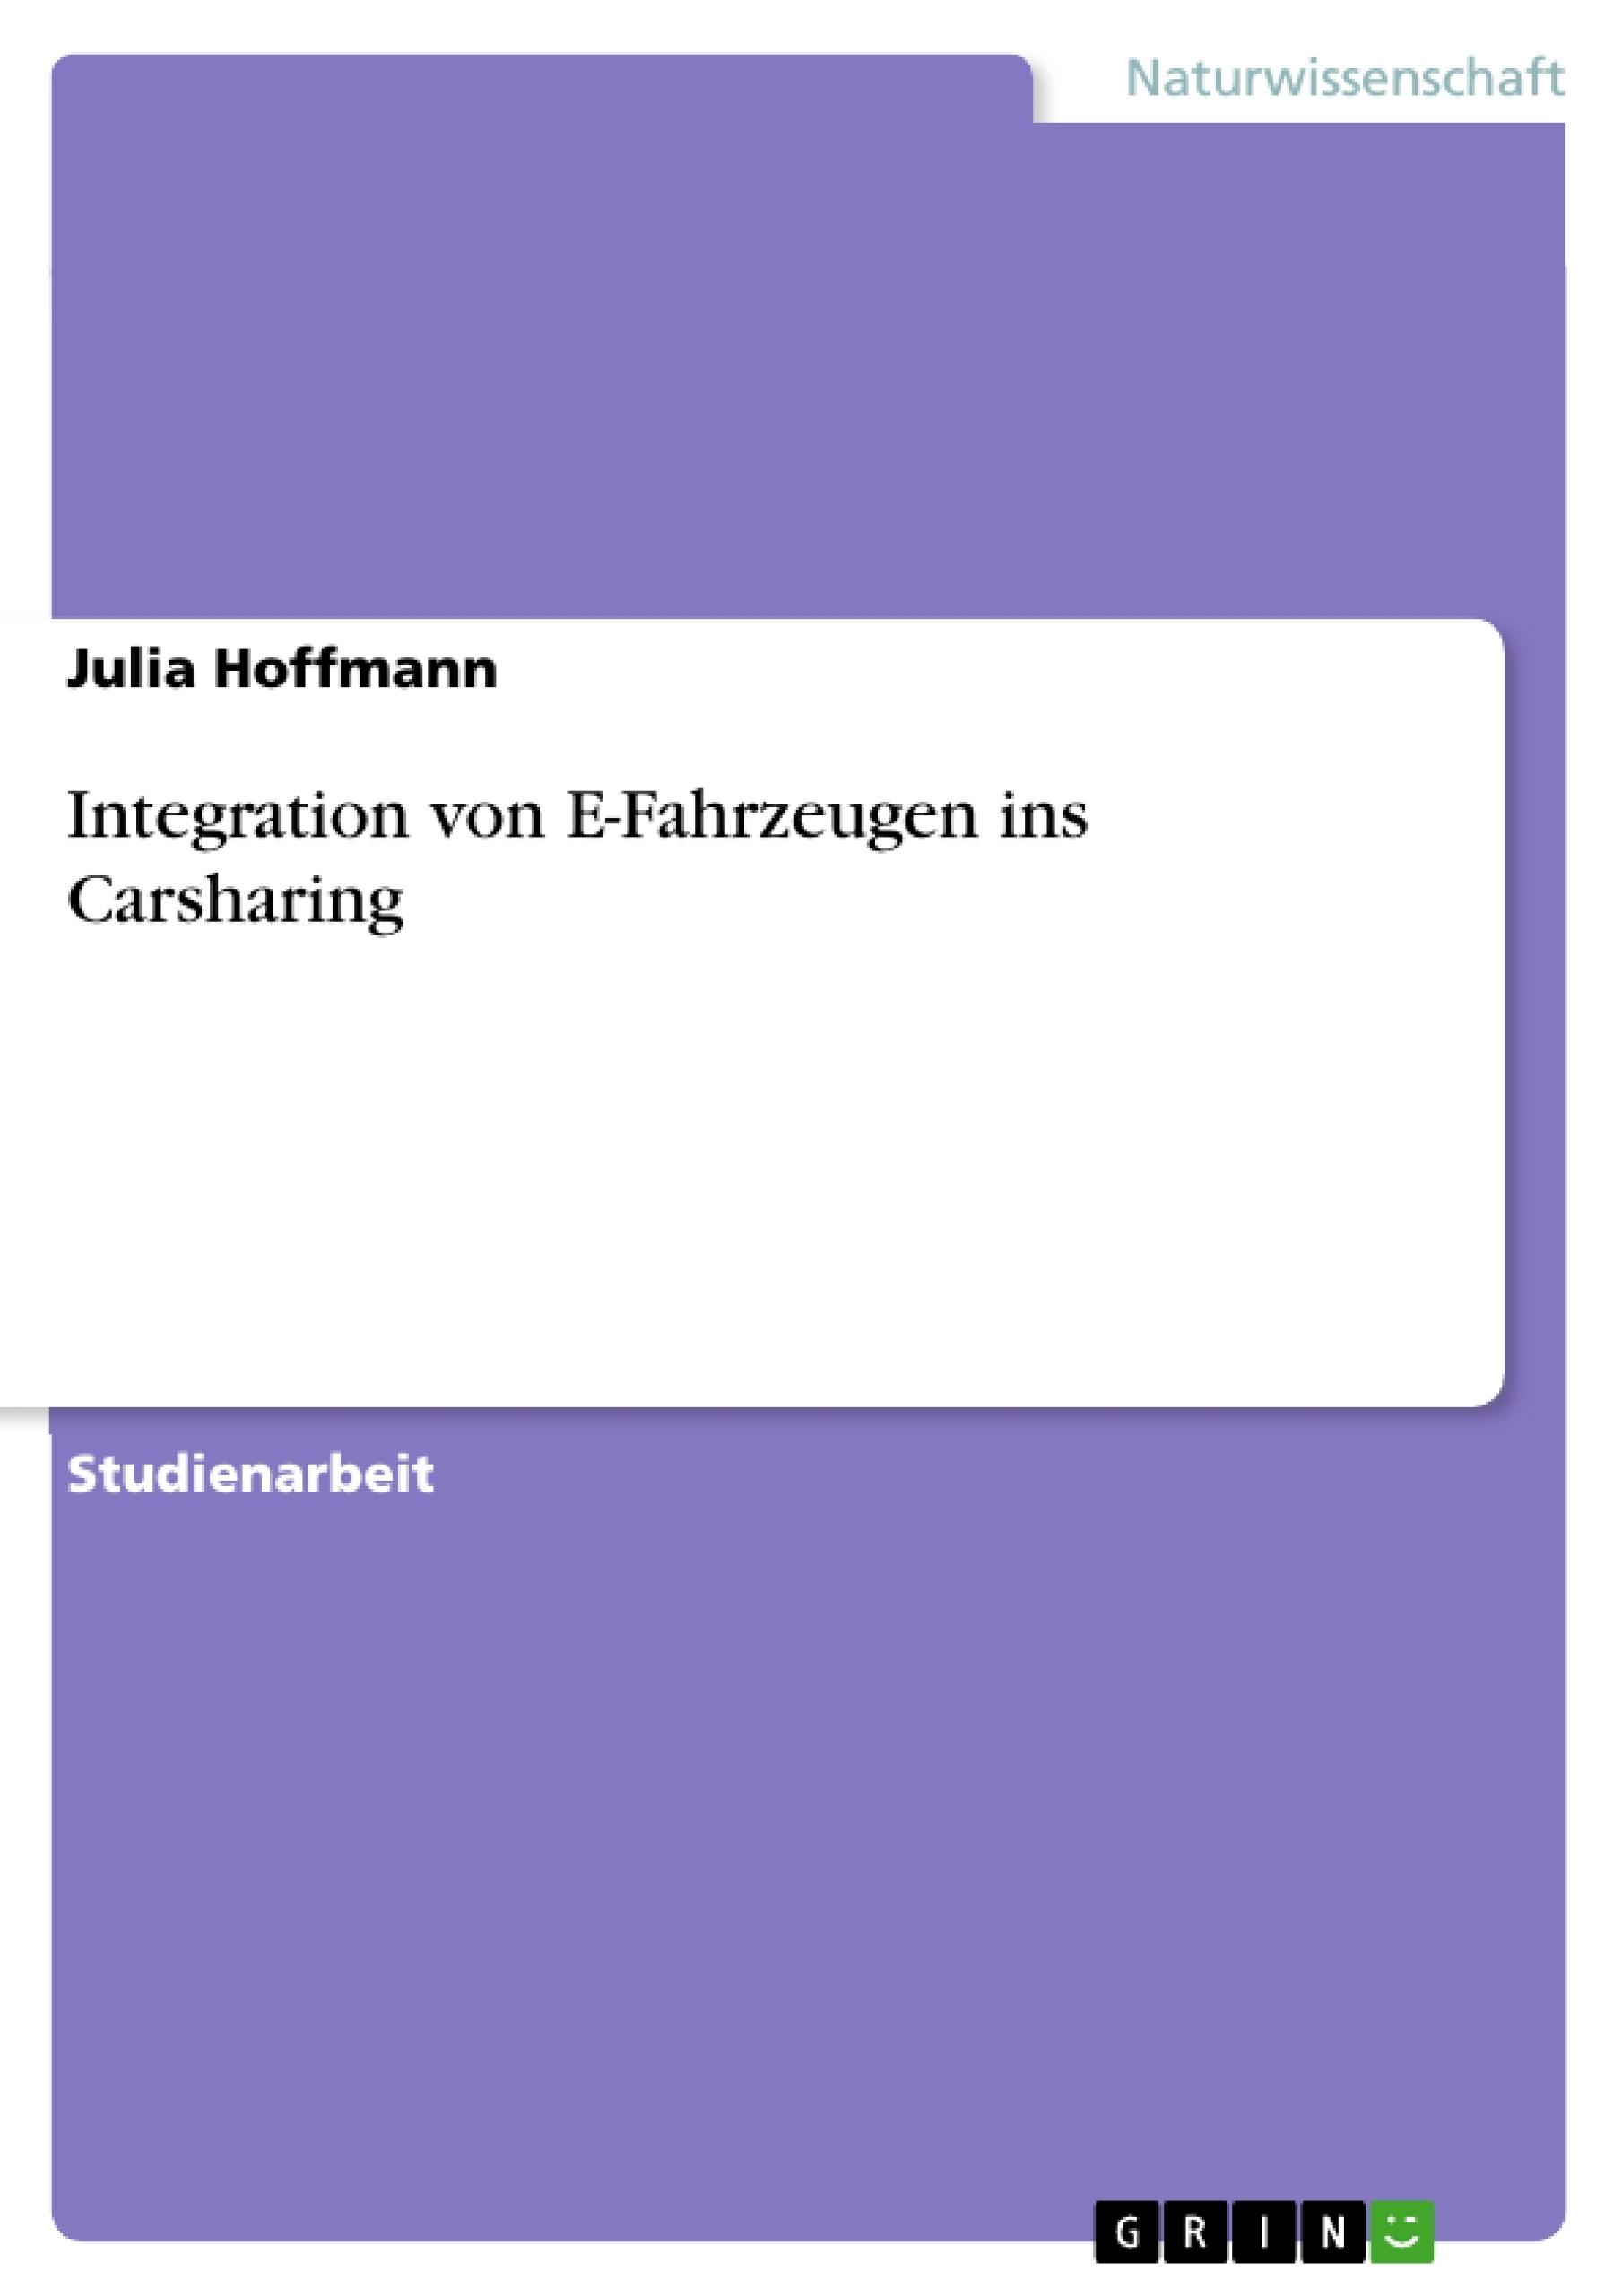 Titel: Integration von E-Fahrzeugen ins Carsharing